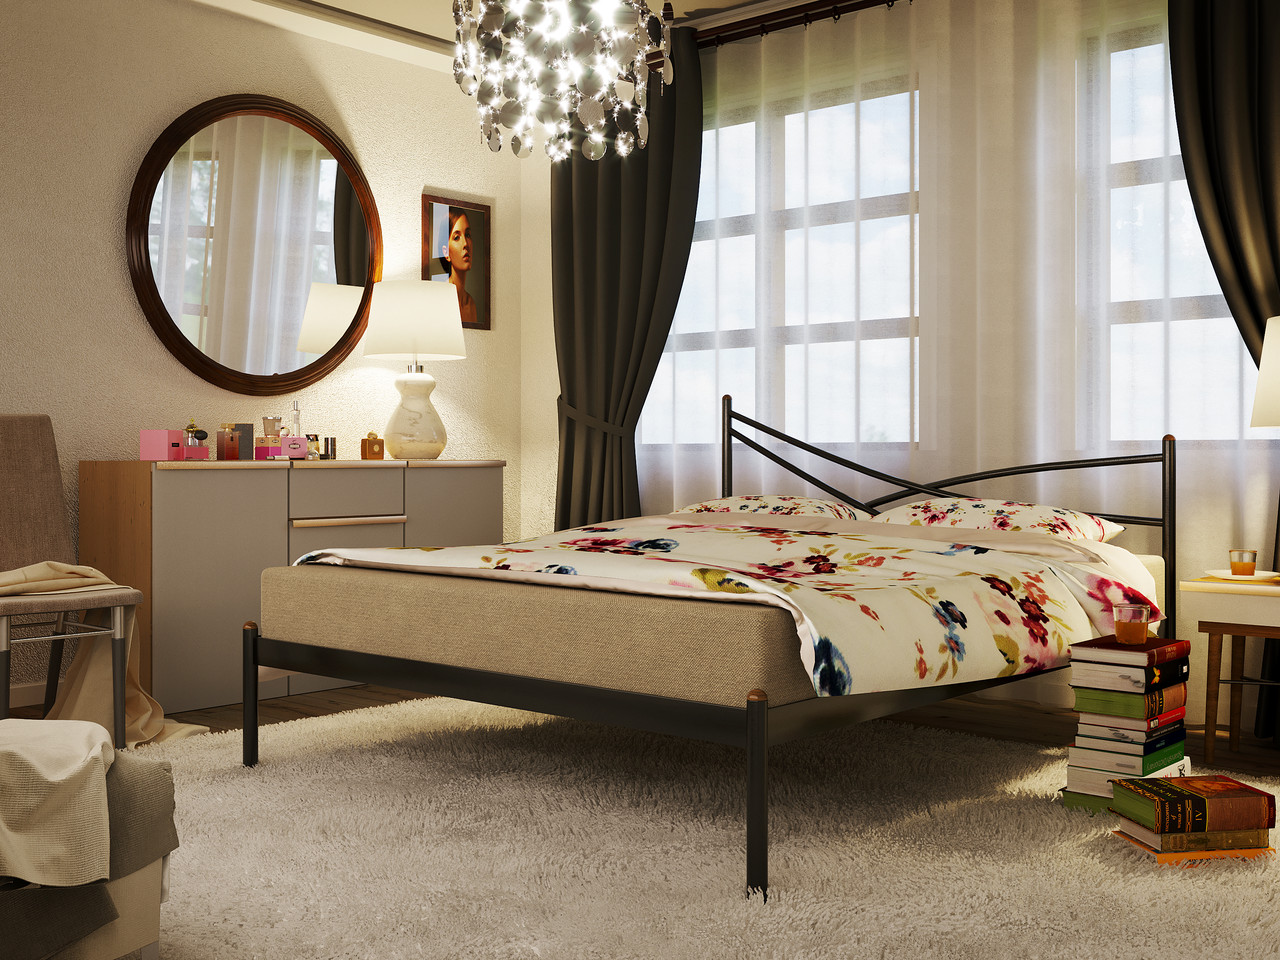 Кровать Лиана / Liana, фабрика Метакам